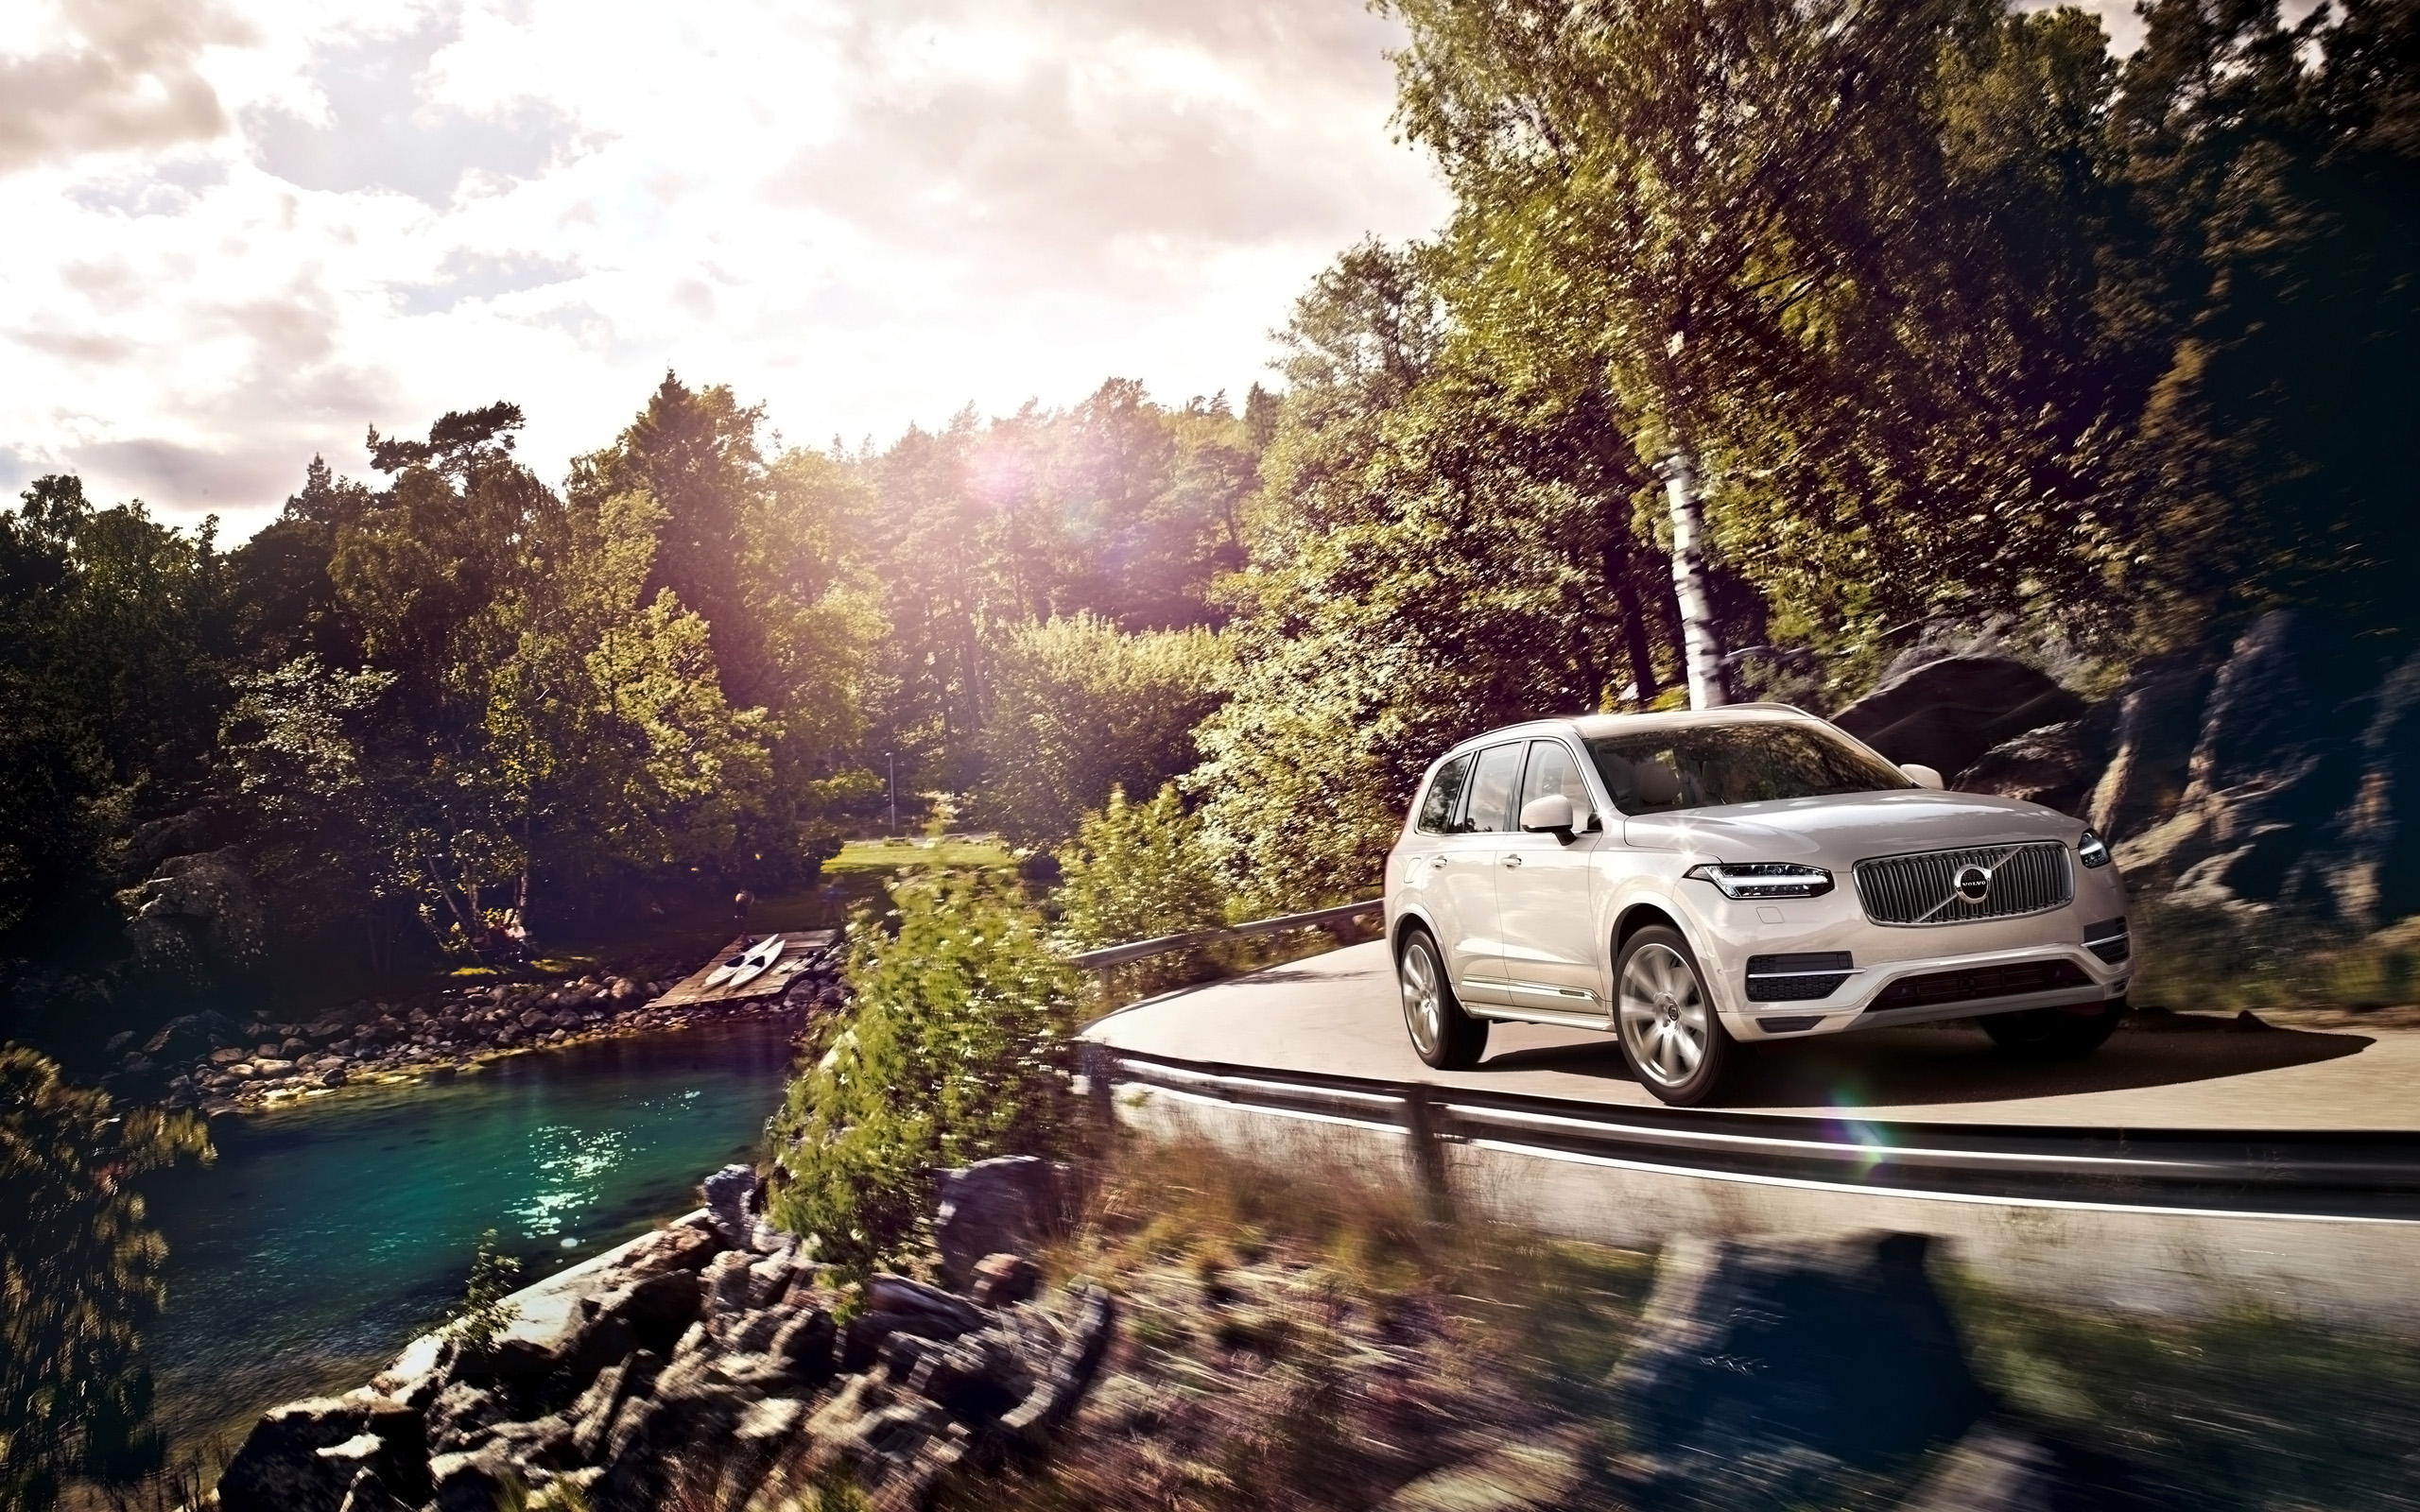 2015 Volvo Xc90 Wallpaper Hd Car Wallpapers Id 4759